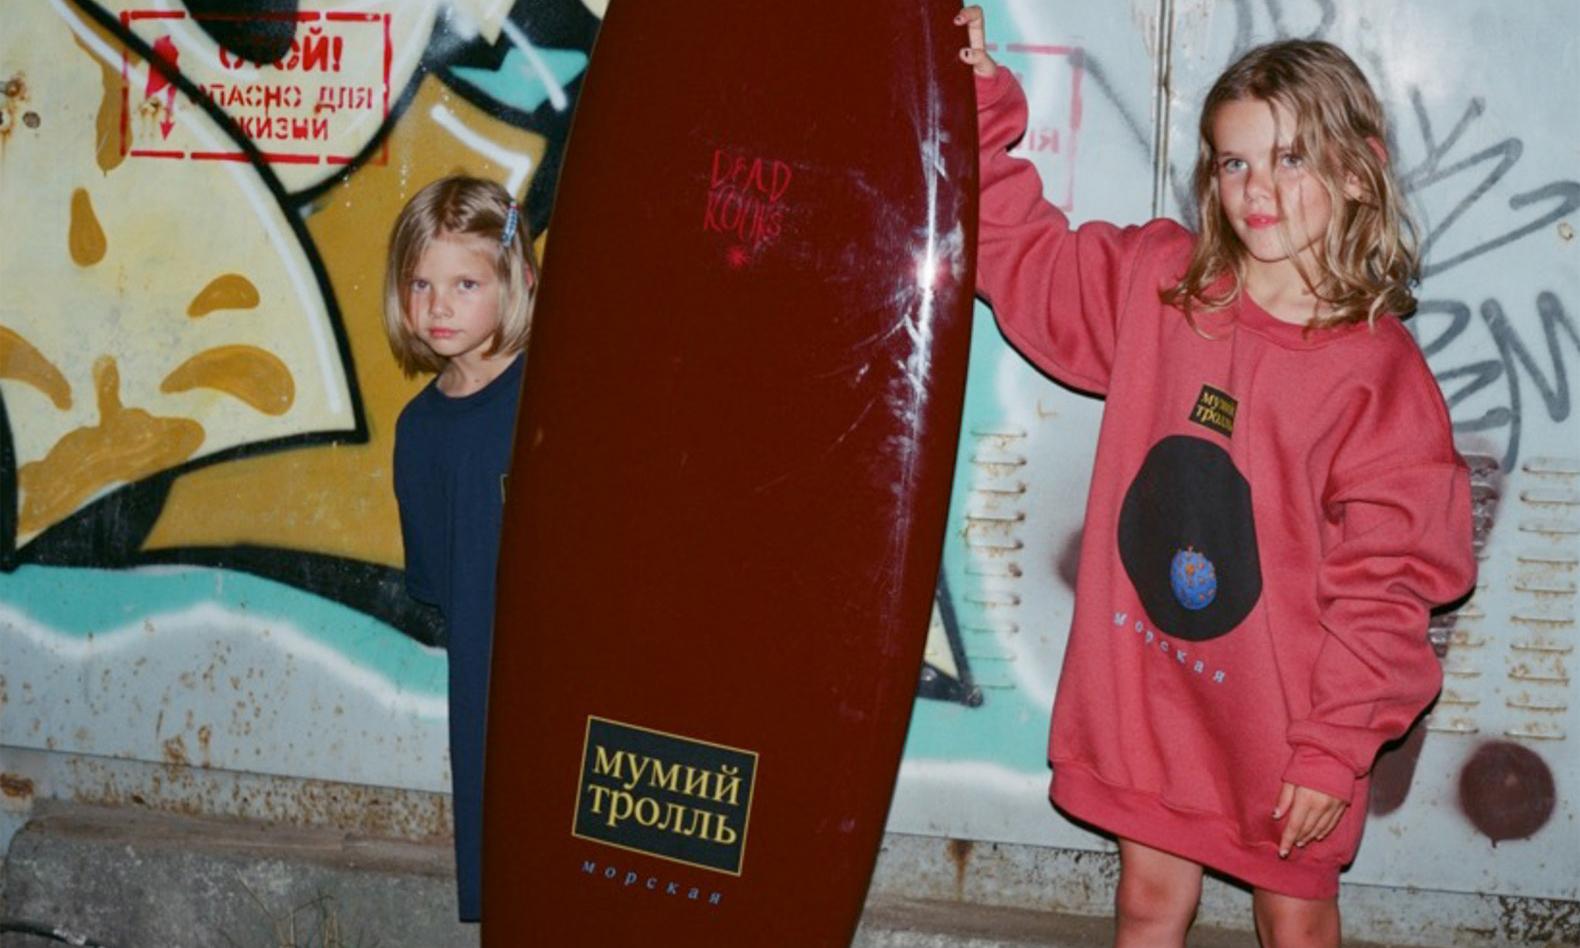 Gosha Rubchinskiy 与俄罗斯乐队 Mumiy Troll 推出胶囊系列合集